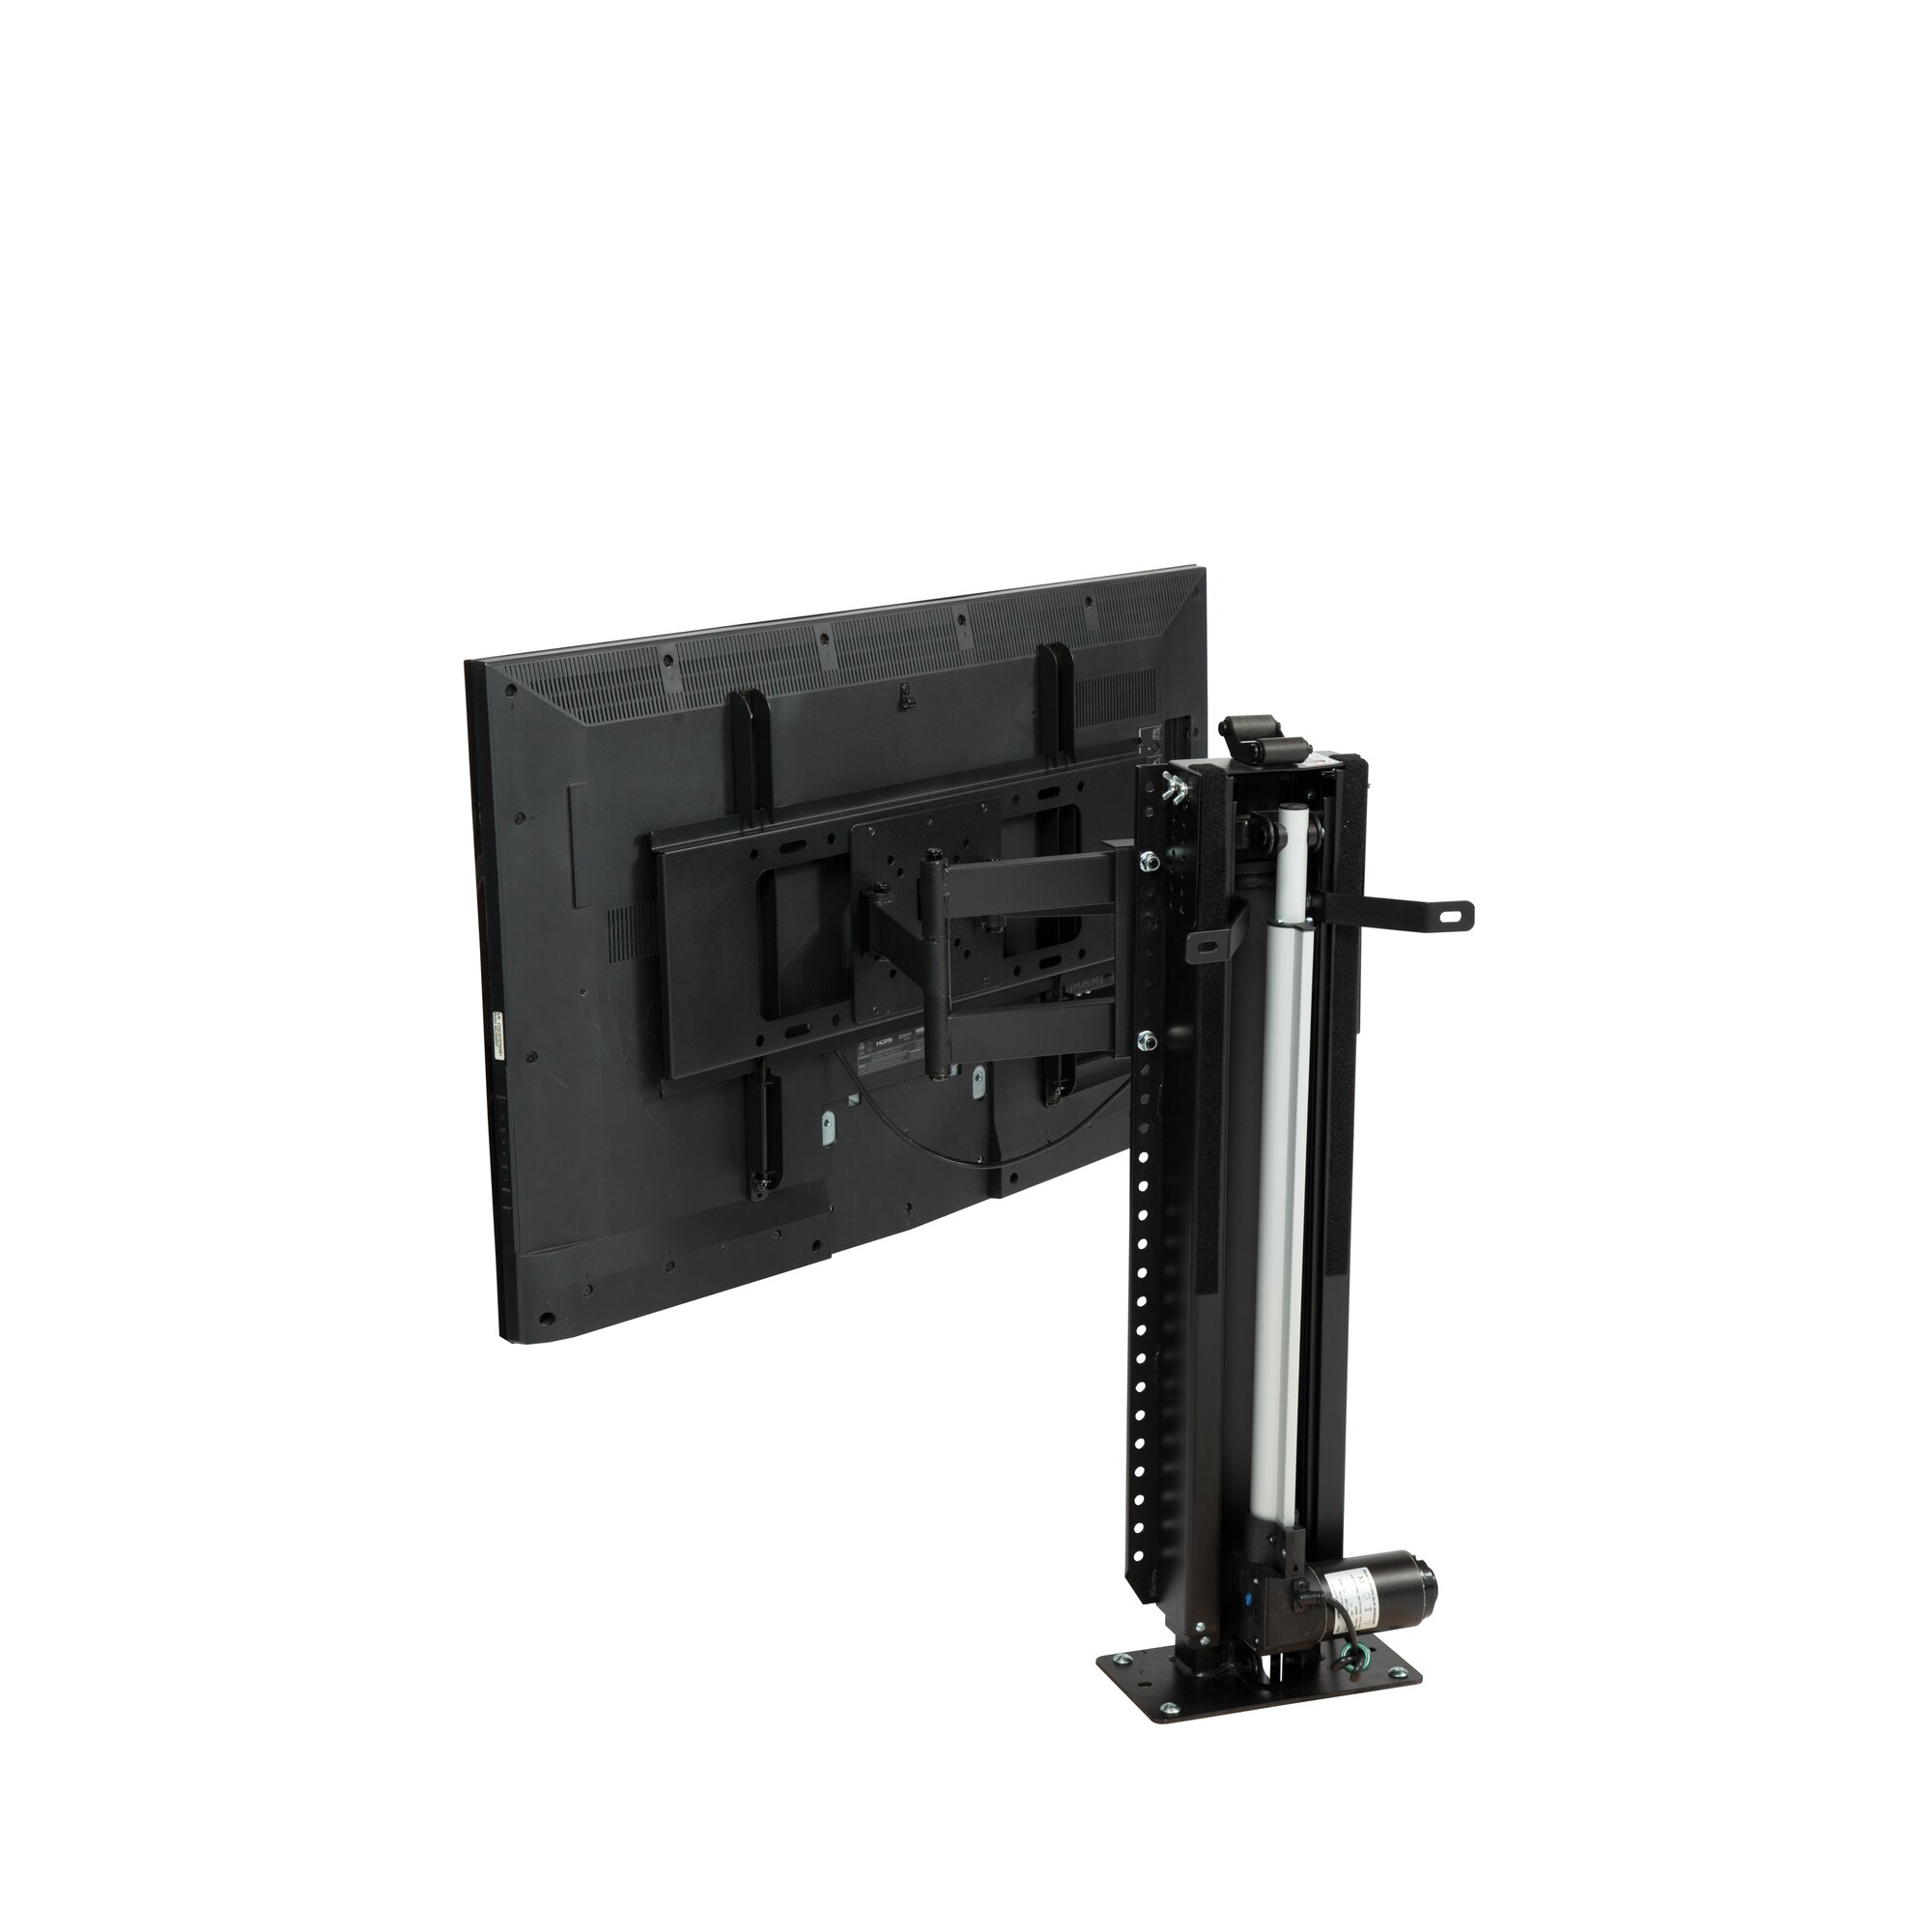 Touchstone whisper lift ii pro swivel floor stand mount 65 for Motorized tv lift with swivel